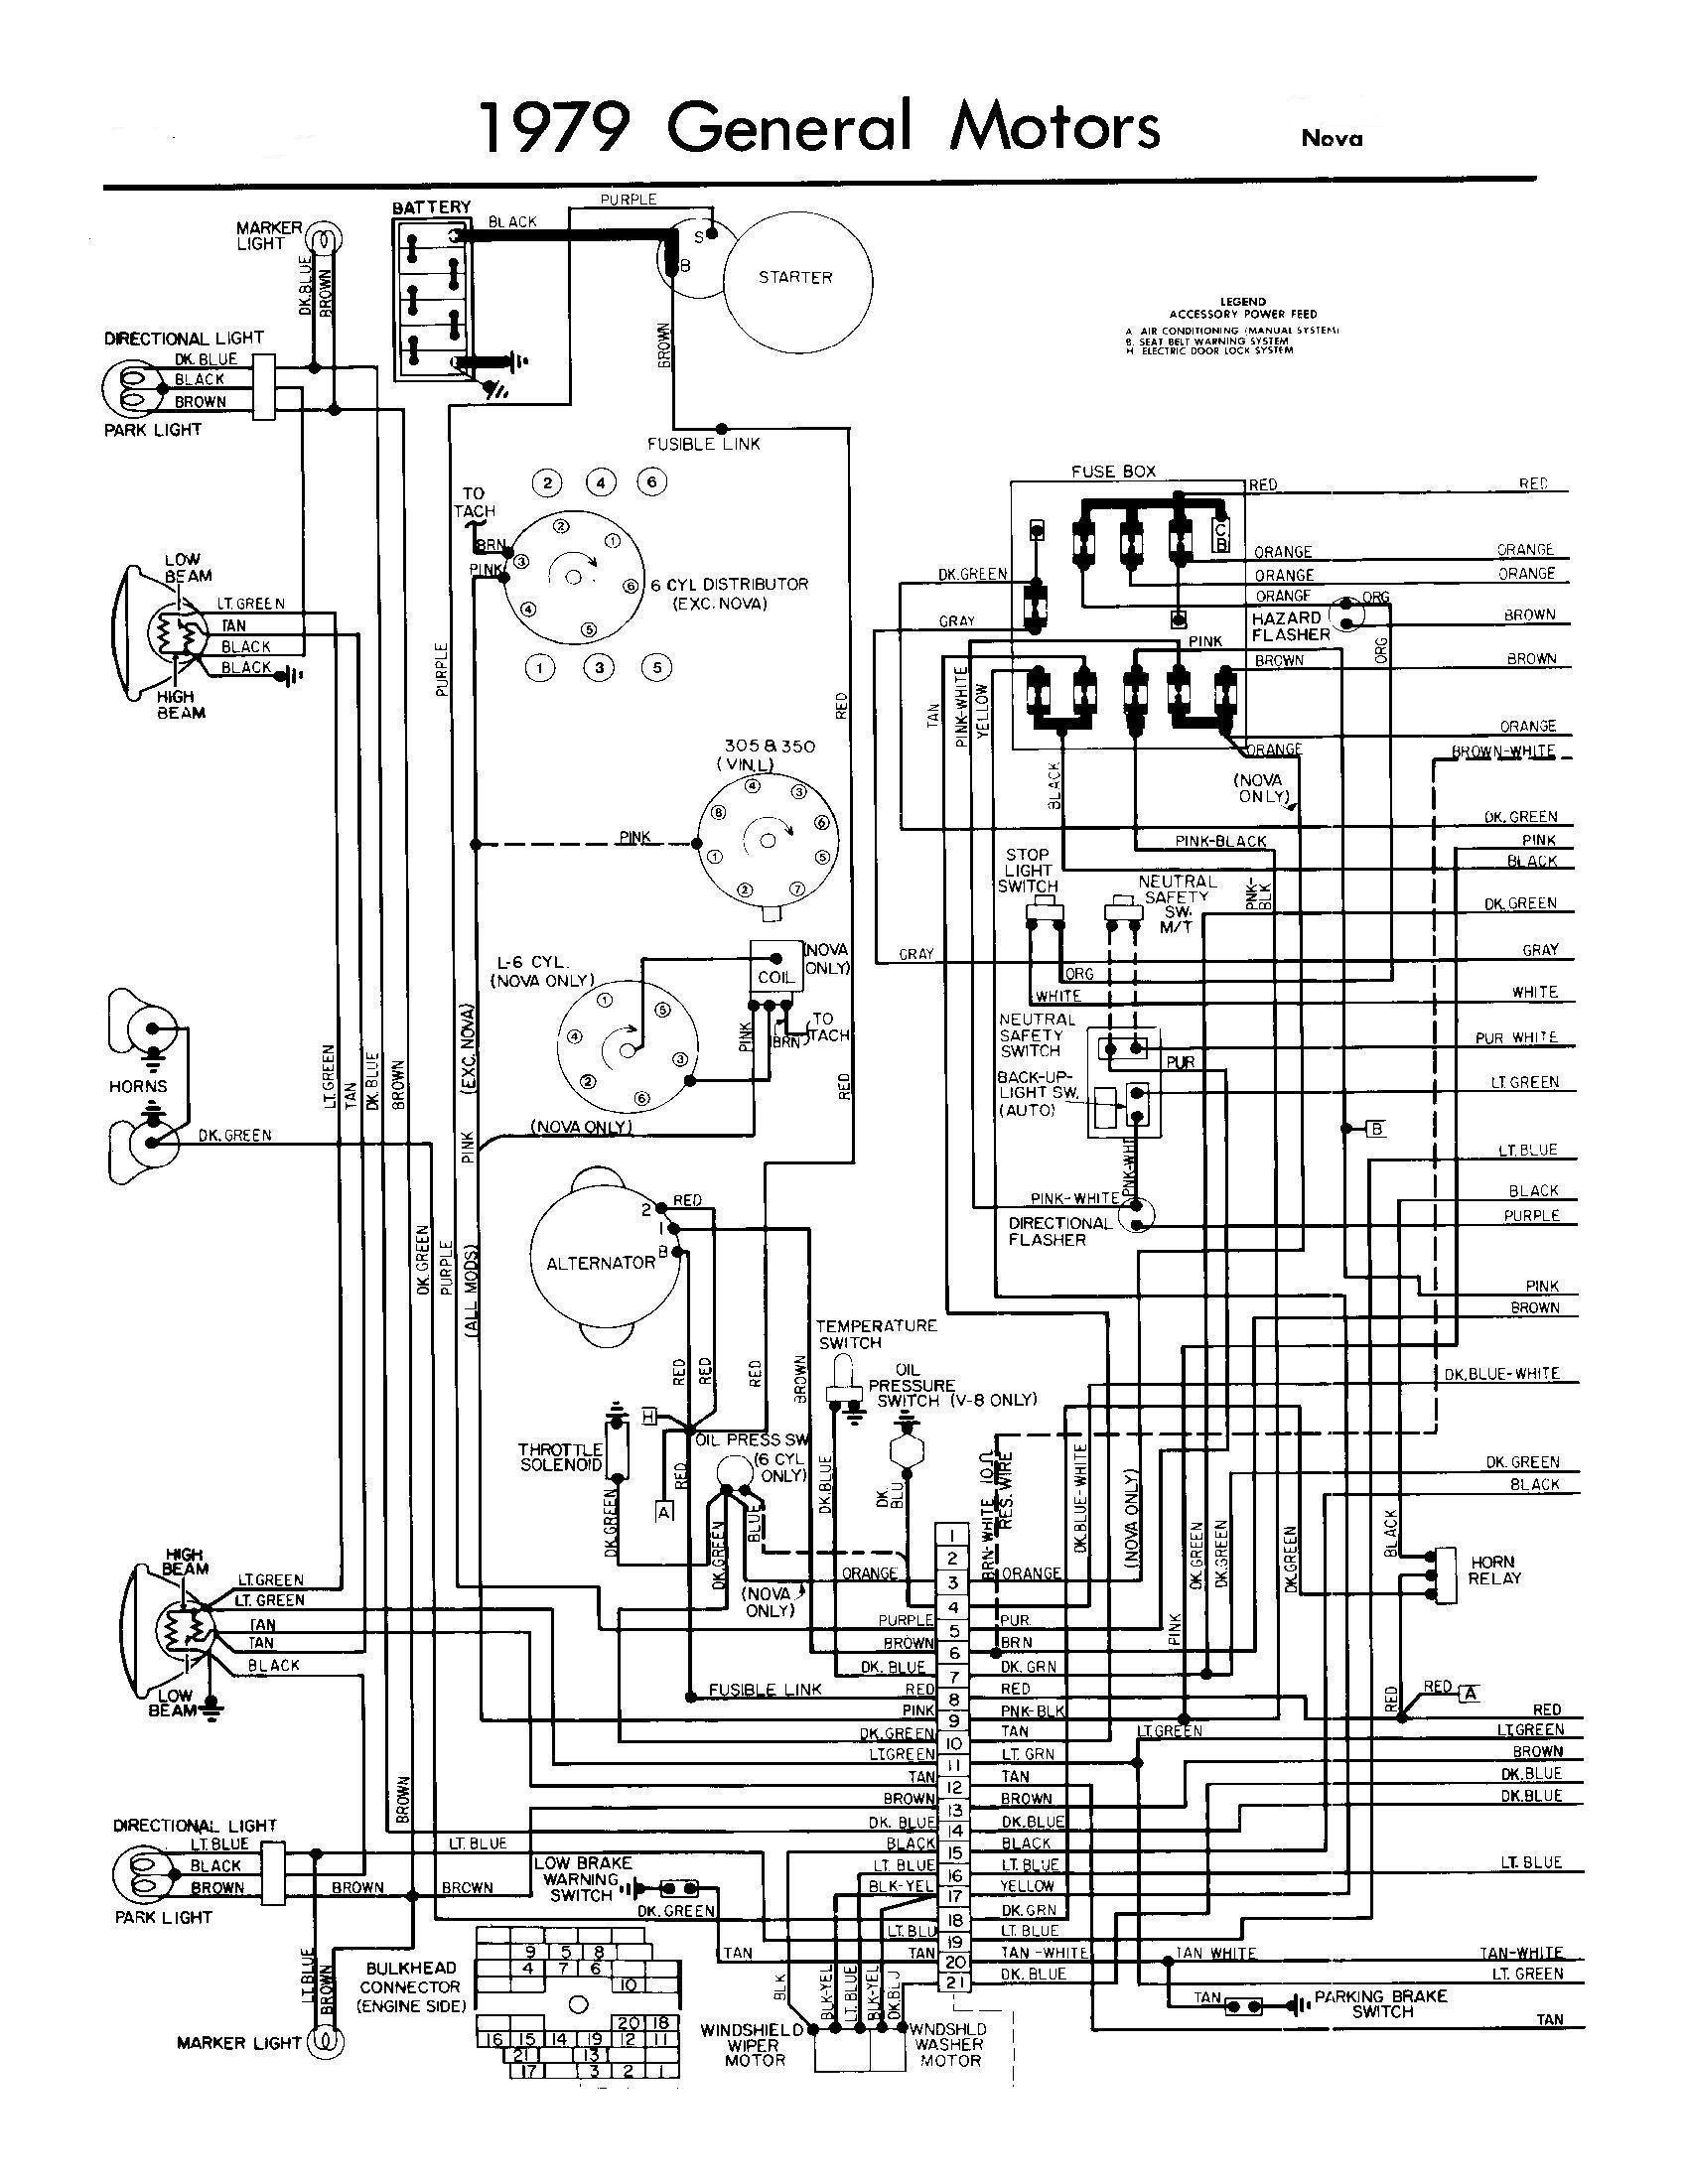 Chevy 454 Engine Diagram 1978 Chevy 350 Starter Wiring Another Blog About Wiring Diagram • Of Chevy 454 Engine Diagram